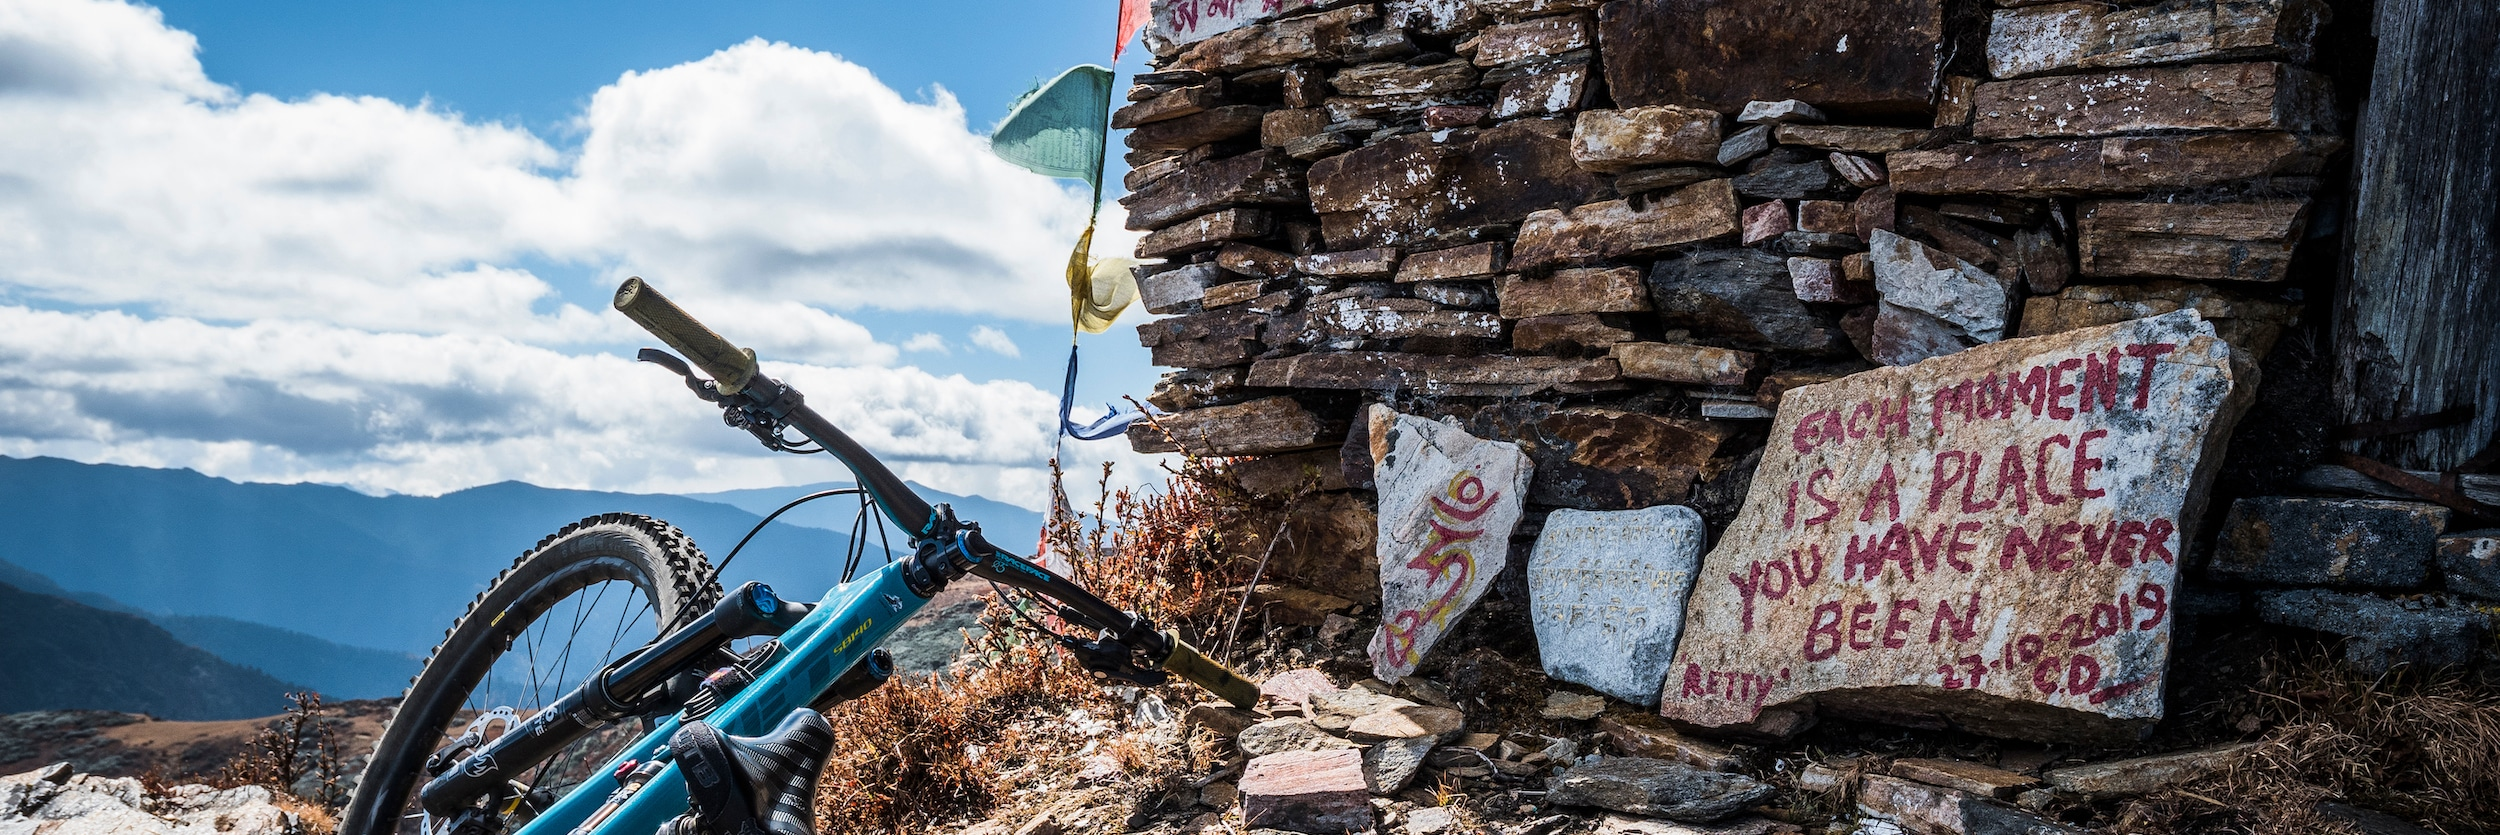 Mountain bike tours worldwide, bike in Bhutan